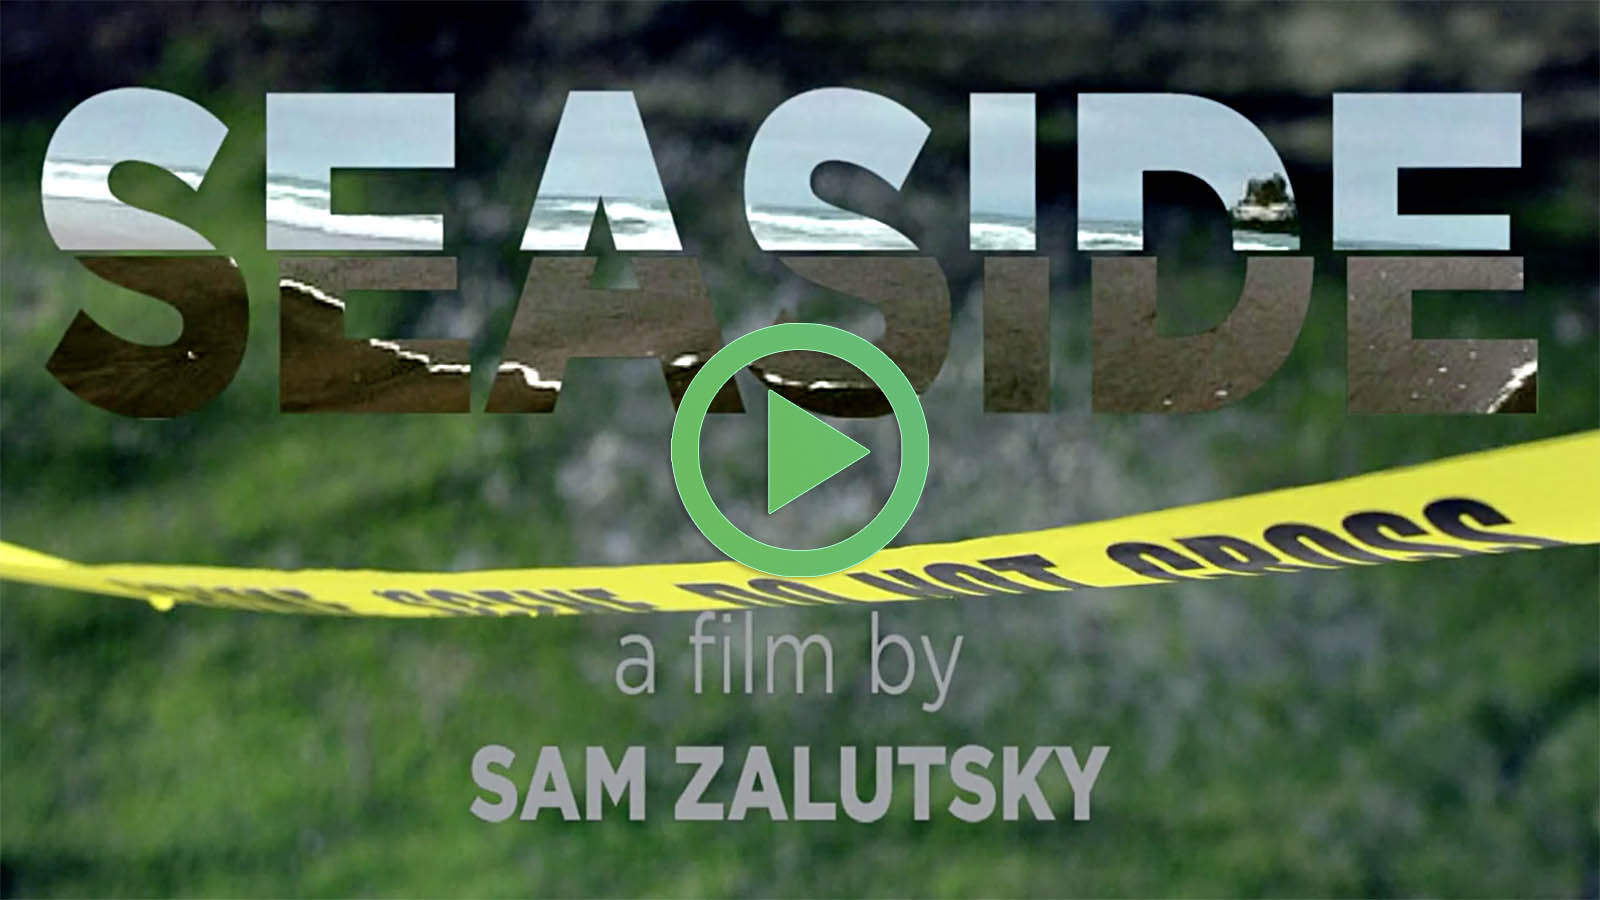 Seaside - Sam Zalutsky, New York NY